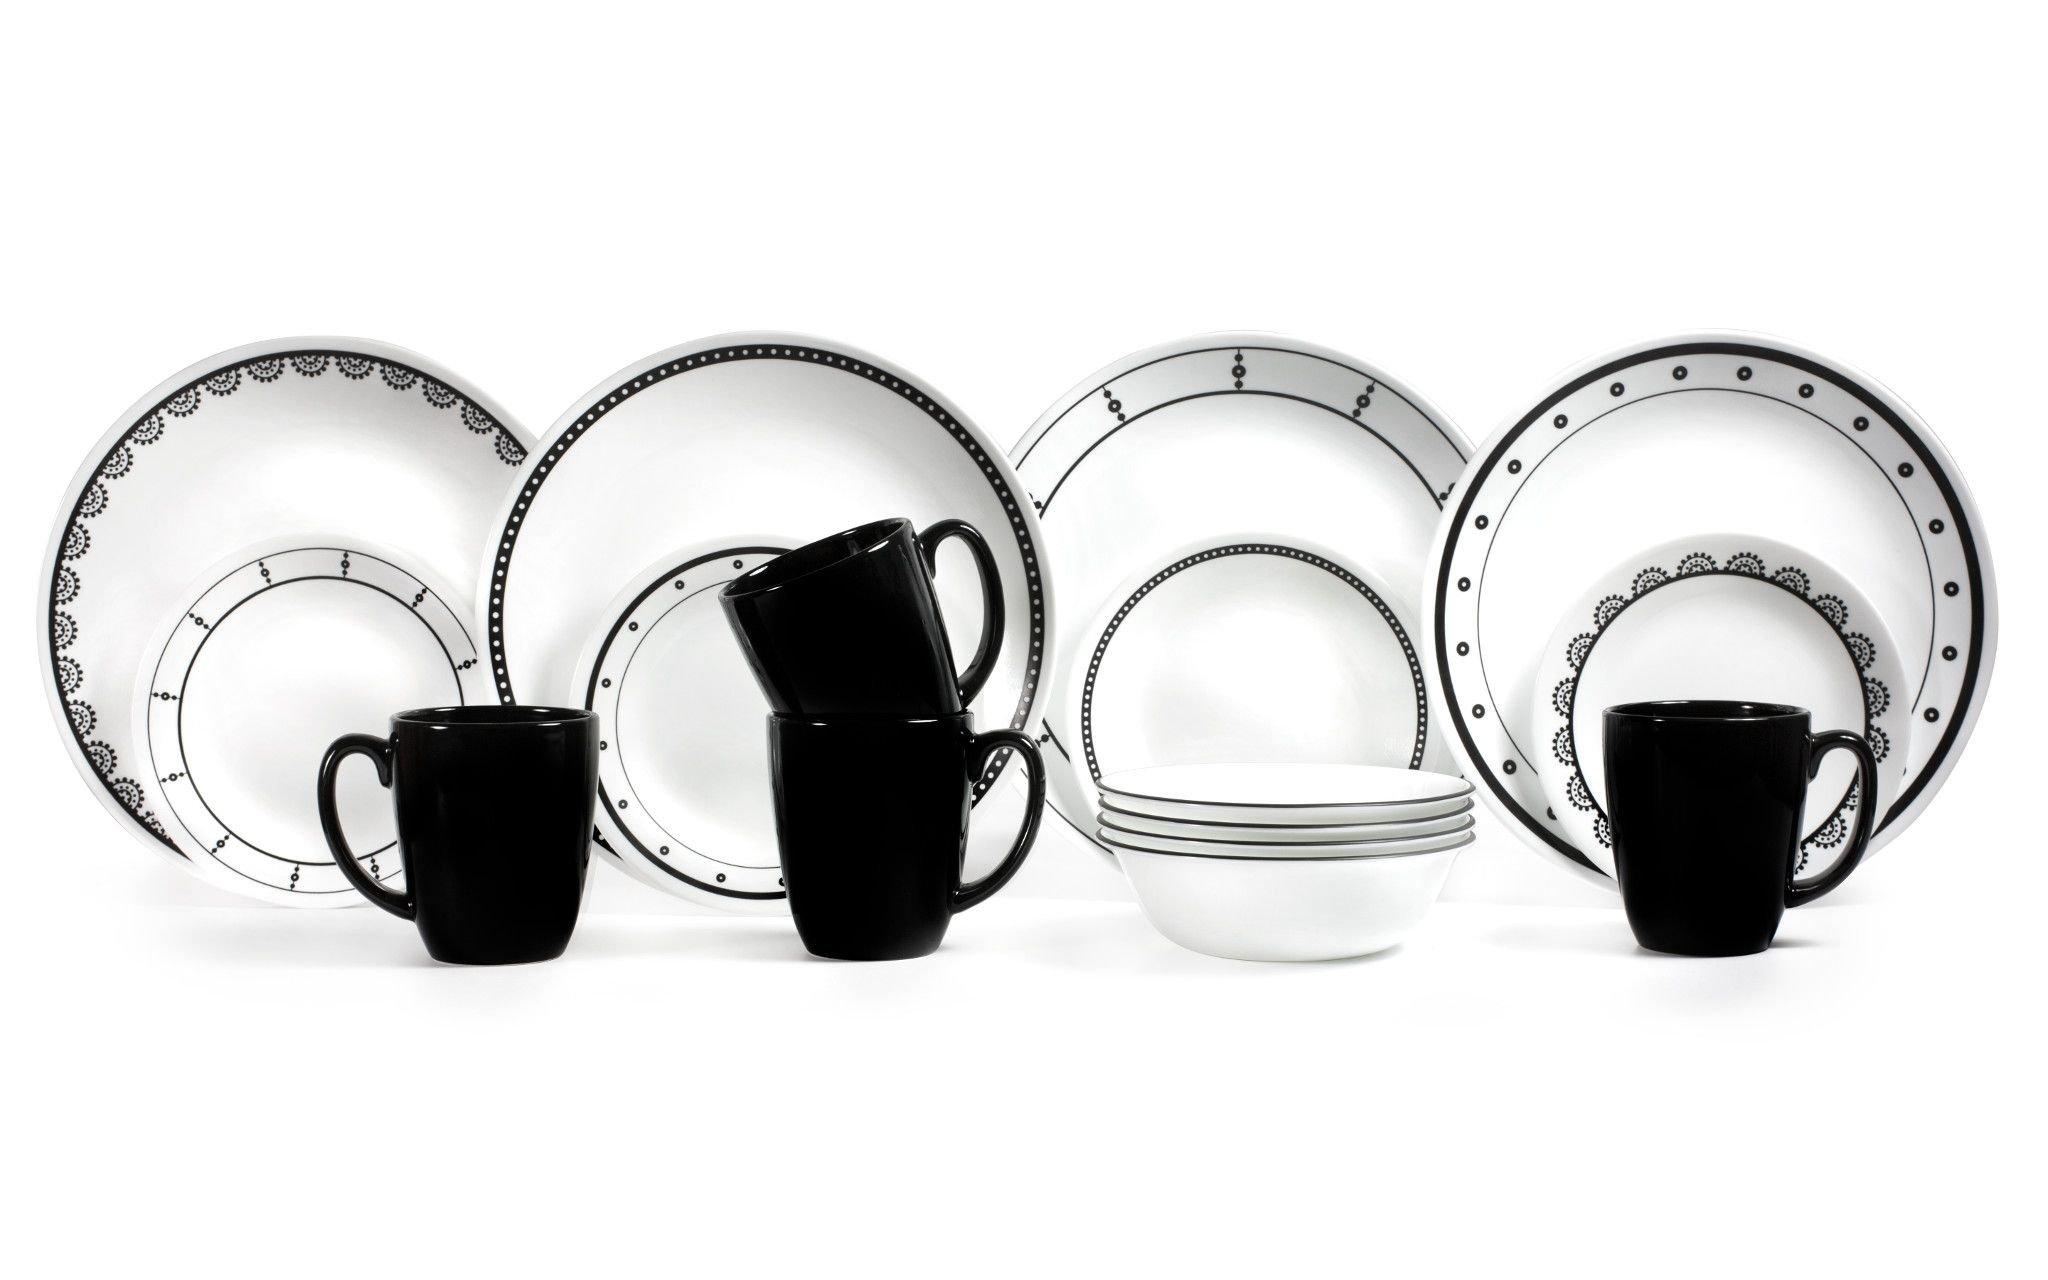 Corelle 1131599 Livingware Black and White 16-Piece Dinnerware Set, 5.75 x 11.25 x 11.00,